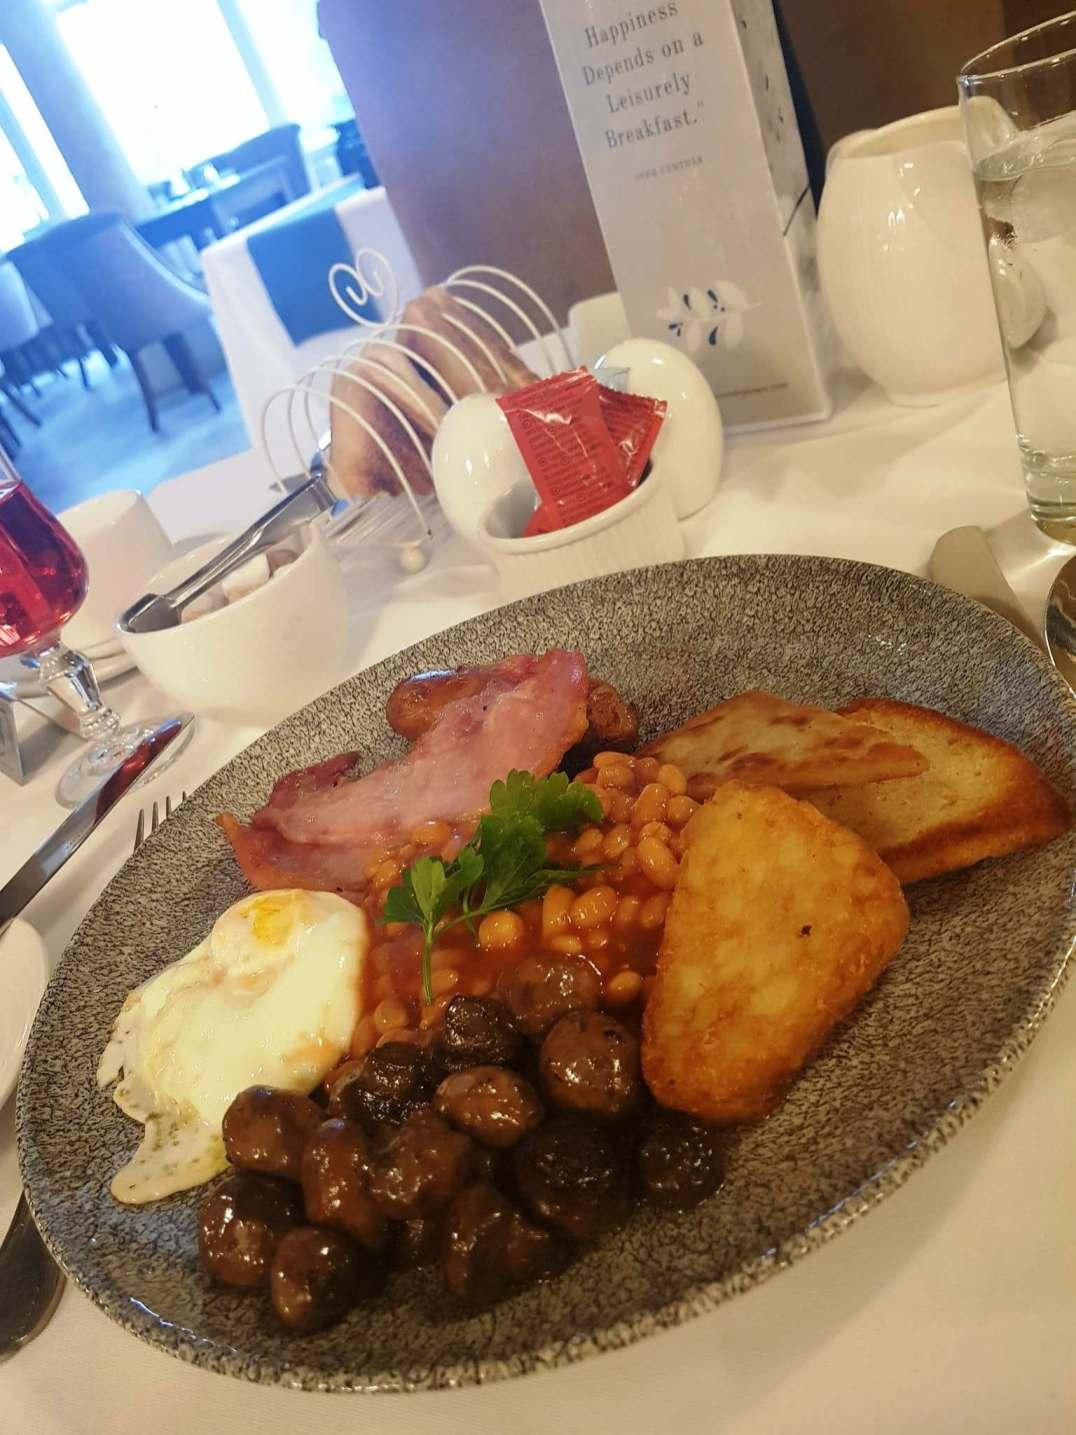 Breakfast at the Carleton Restaurant at Corick House Hotel